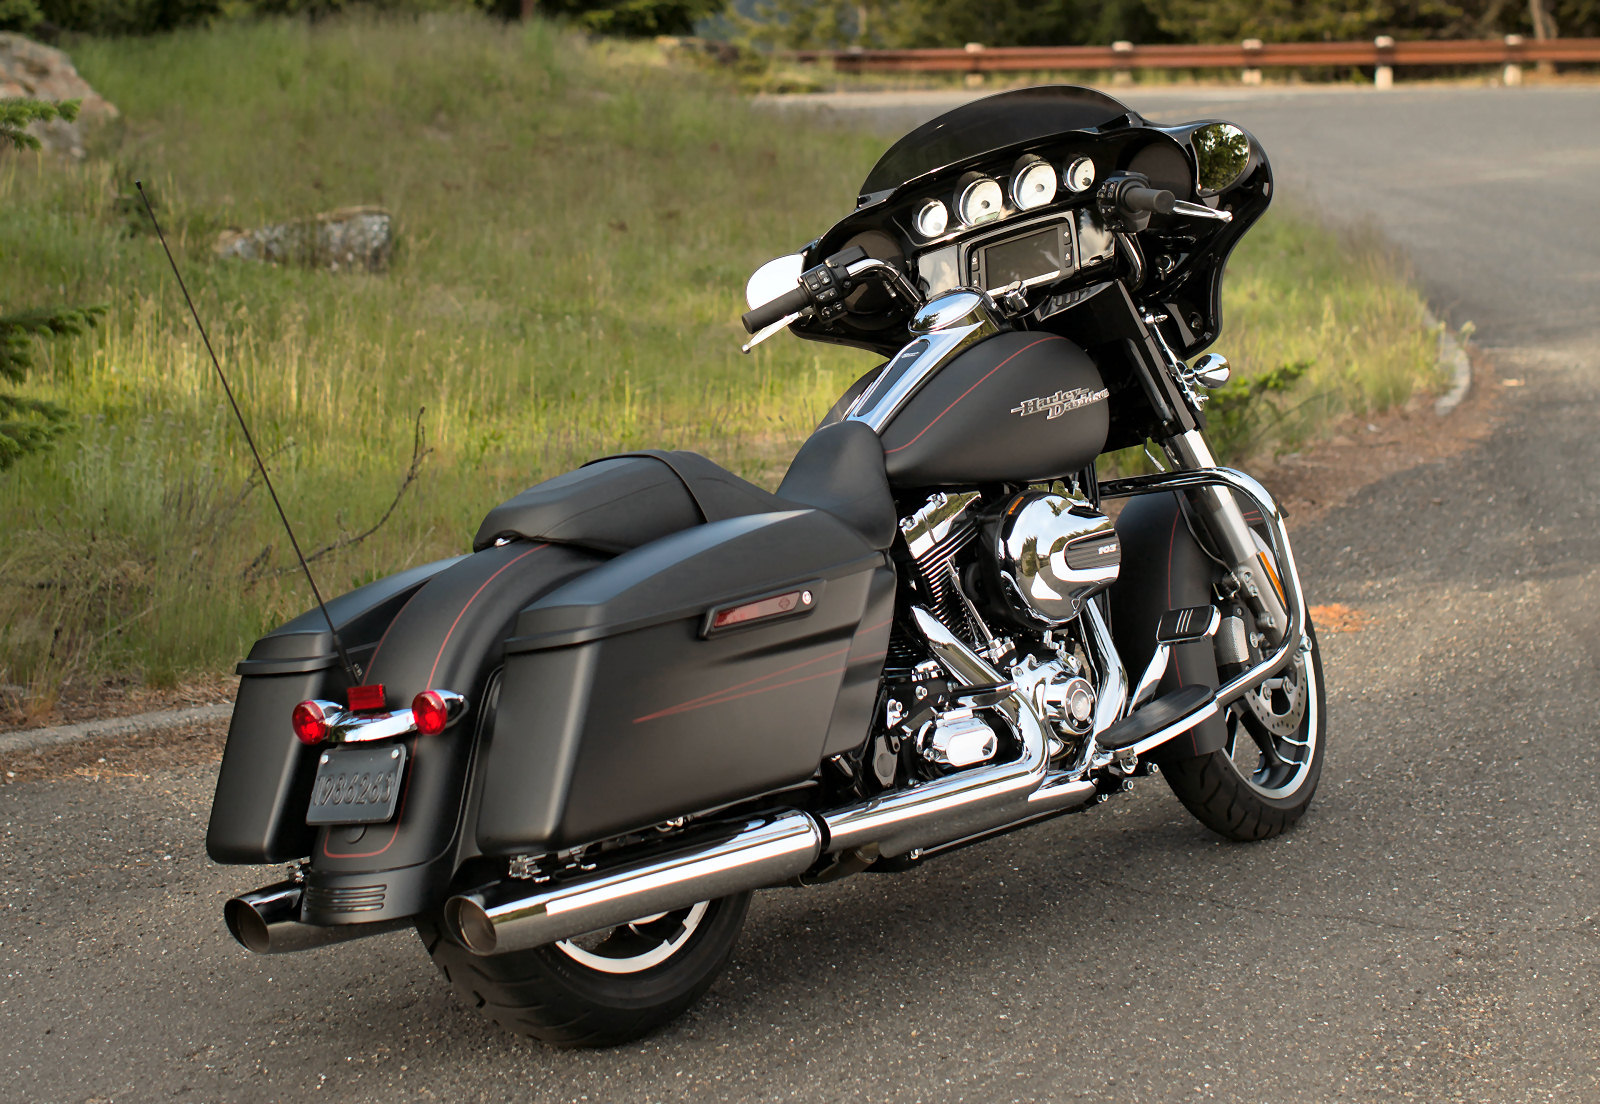 Harley Davidson - Η καλυτερη δουλεια του κοσμου!!! Y451XX